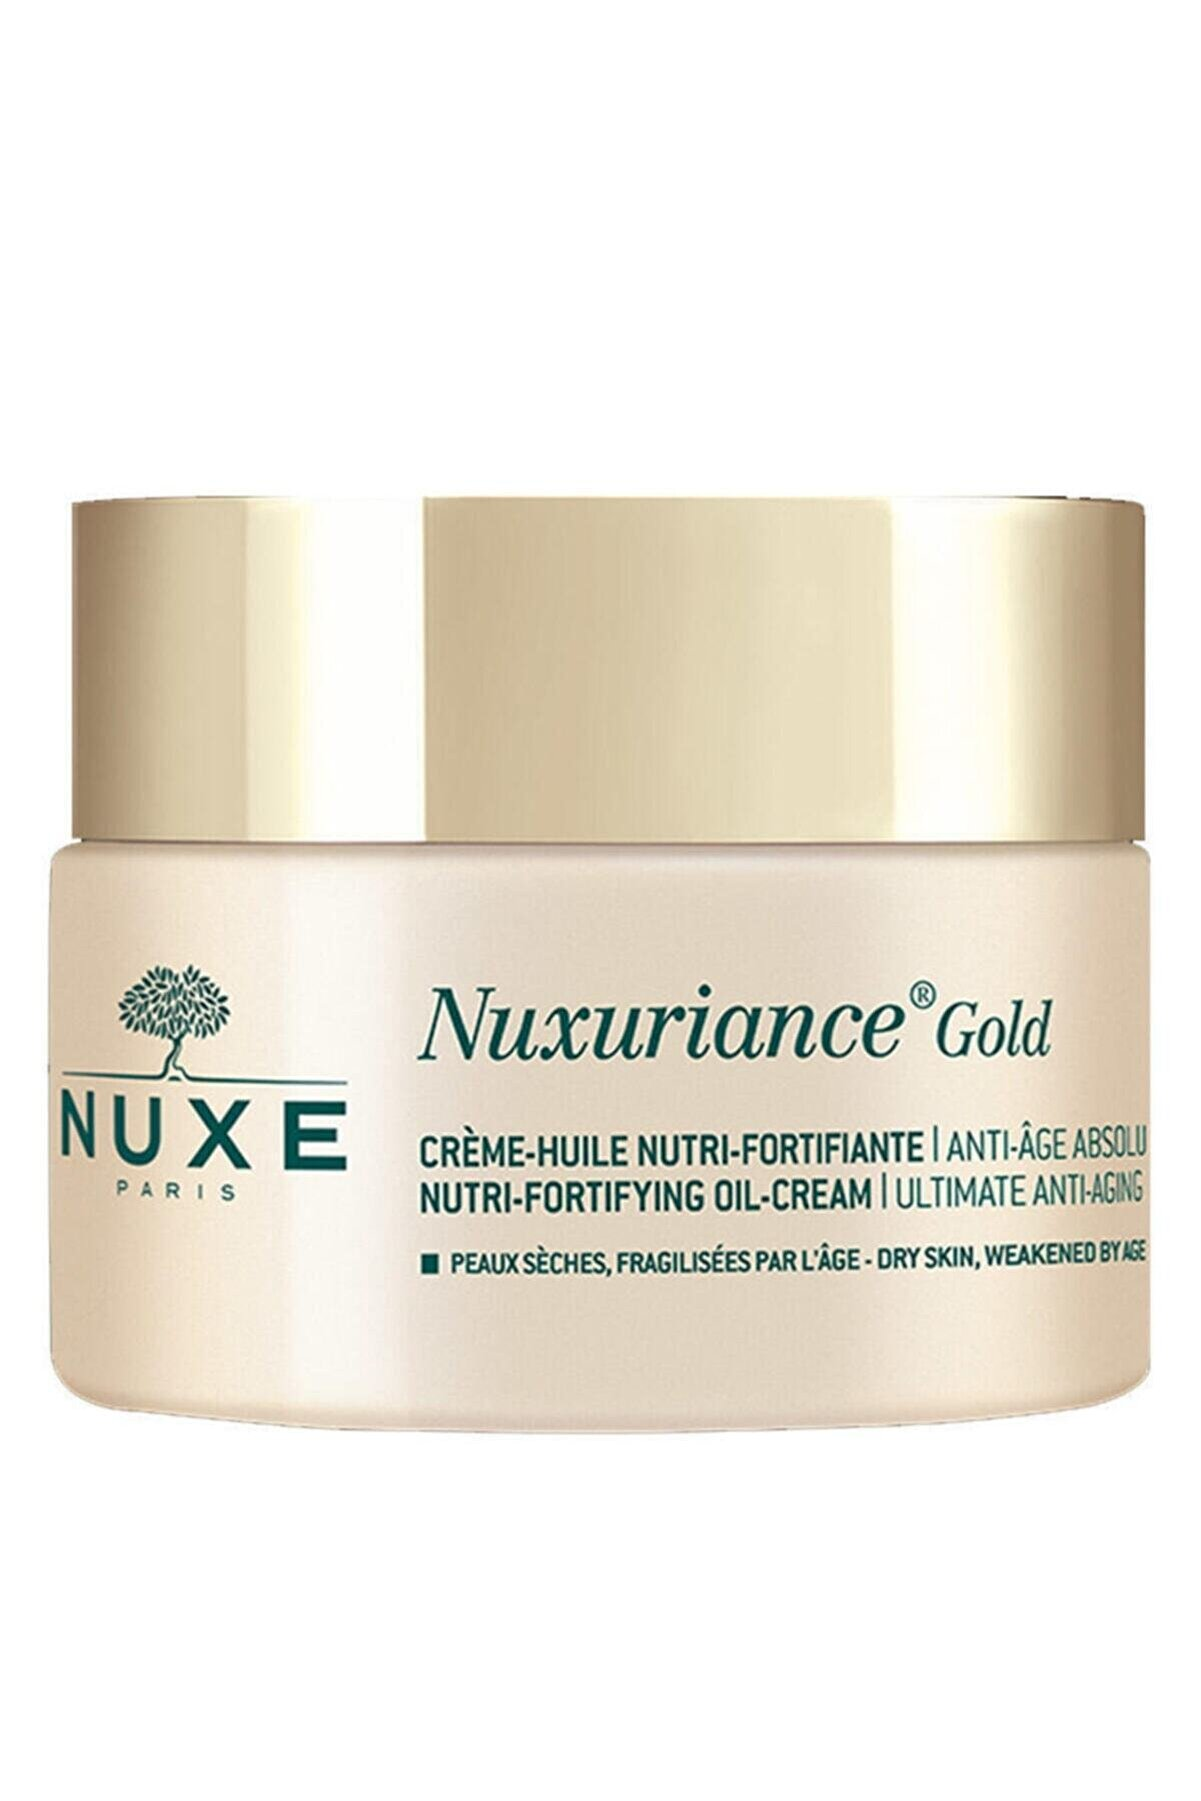 Nuxe Nuxurıance Gold Day Cream